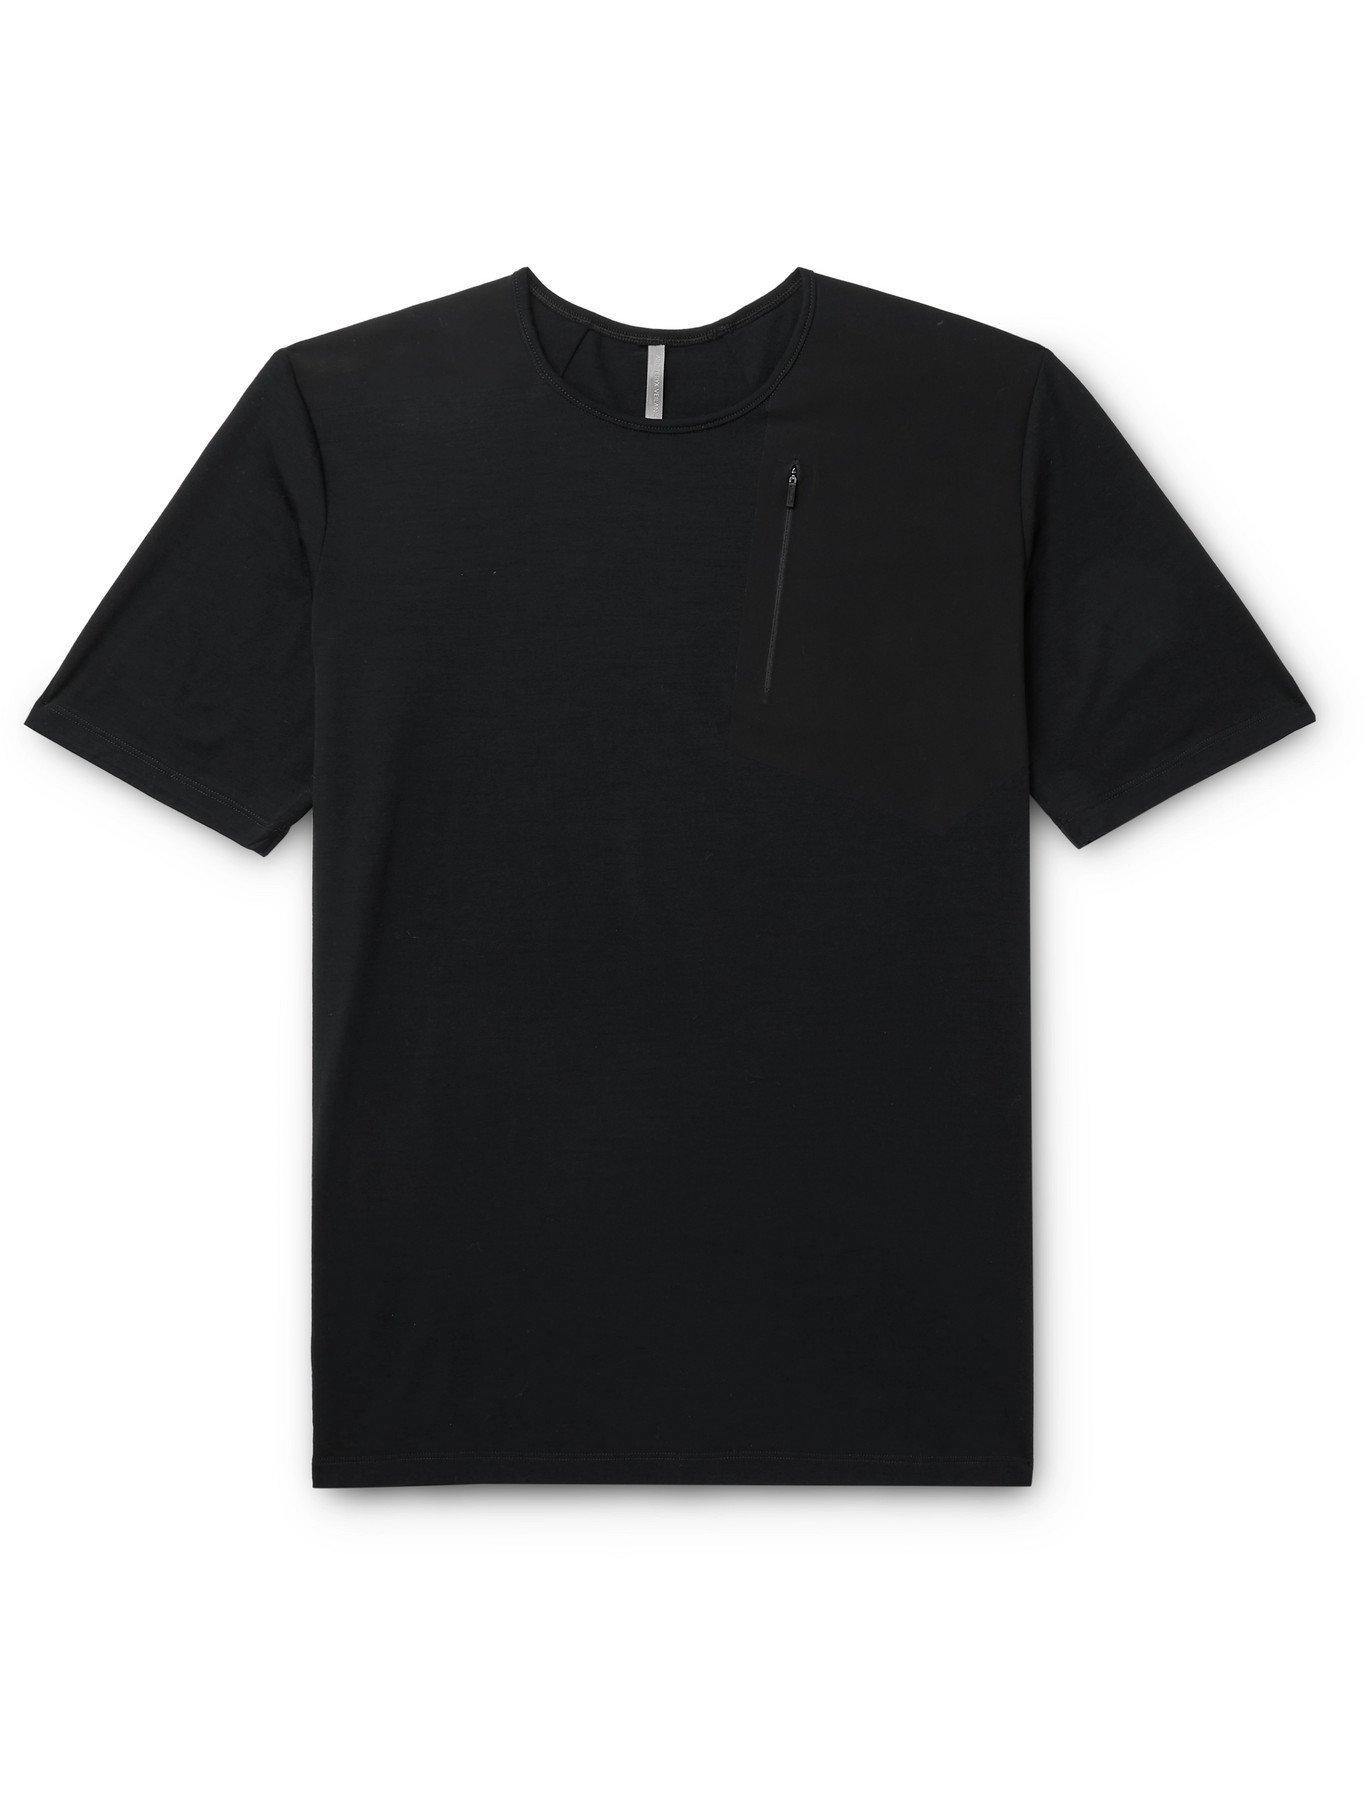 VEILANCE - Frame Merino Wool-Blend Jersey and Stretch-Nylon T-Shirt - Black